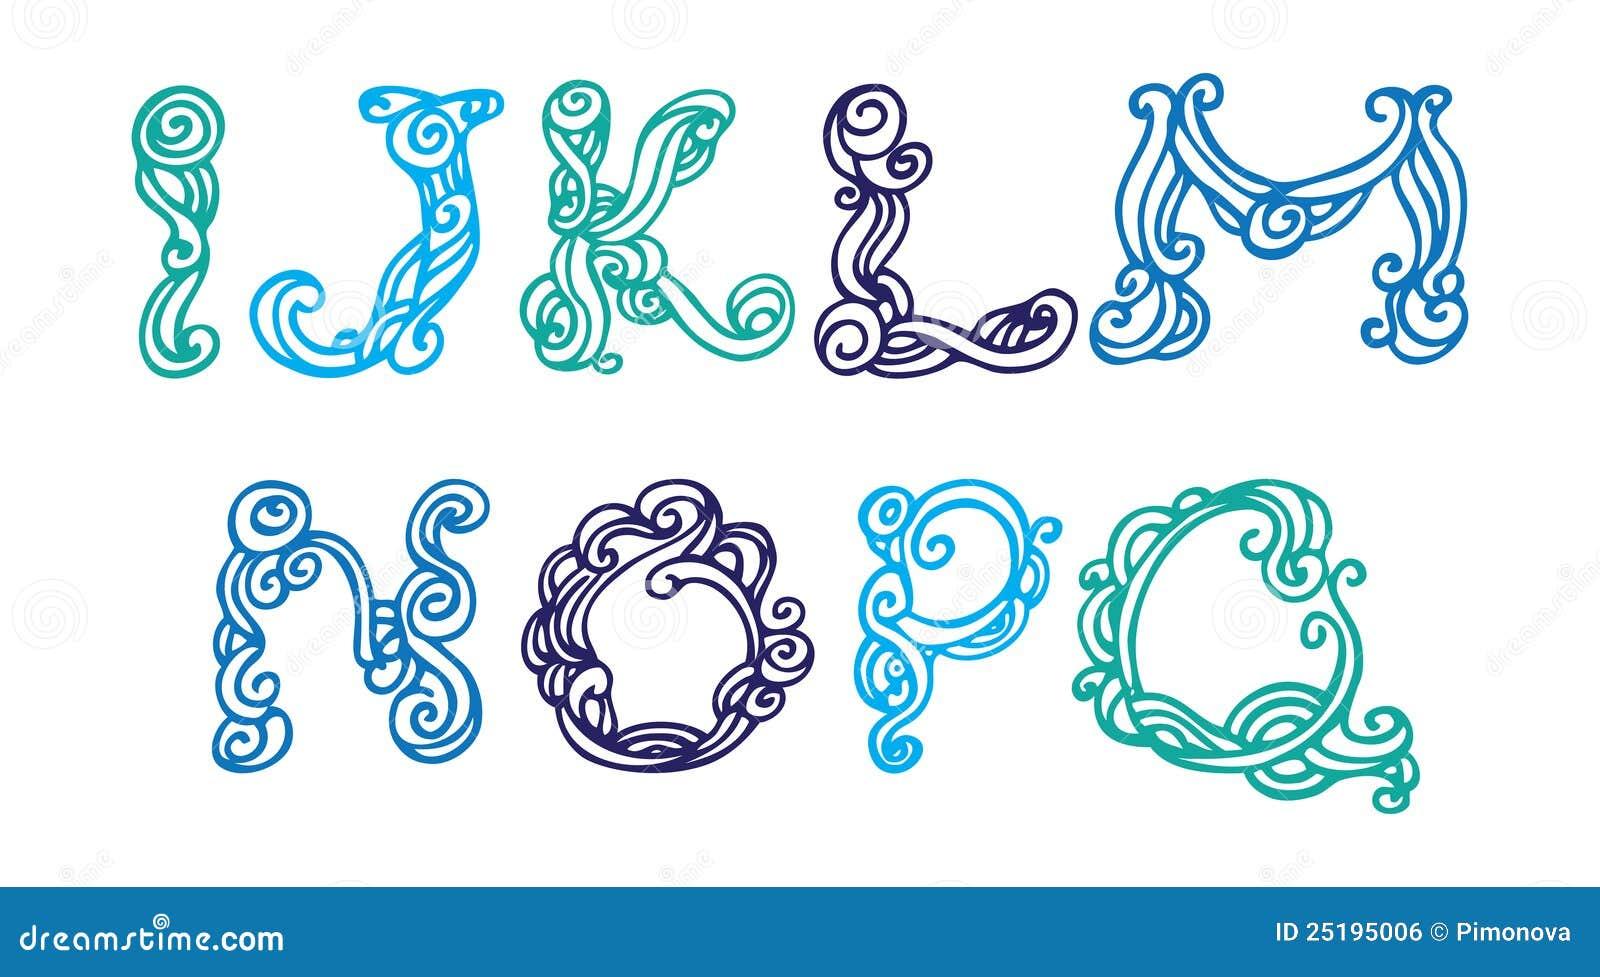 swirly hand drawn font royalty free stock image image